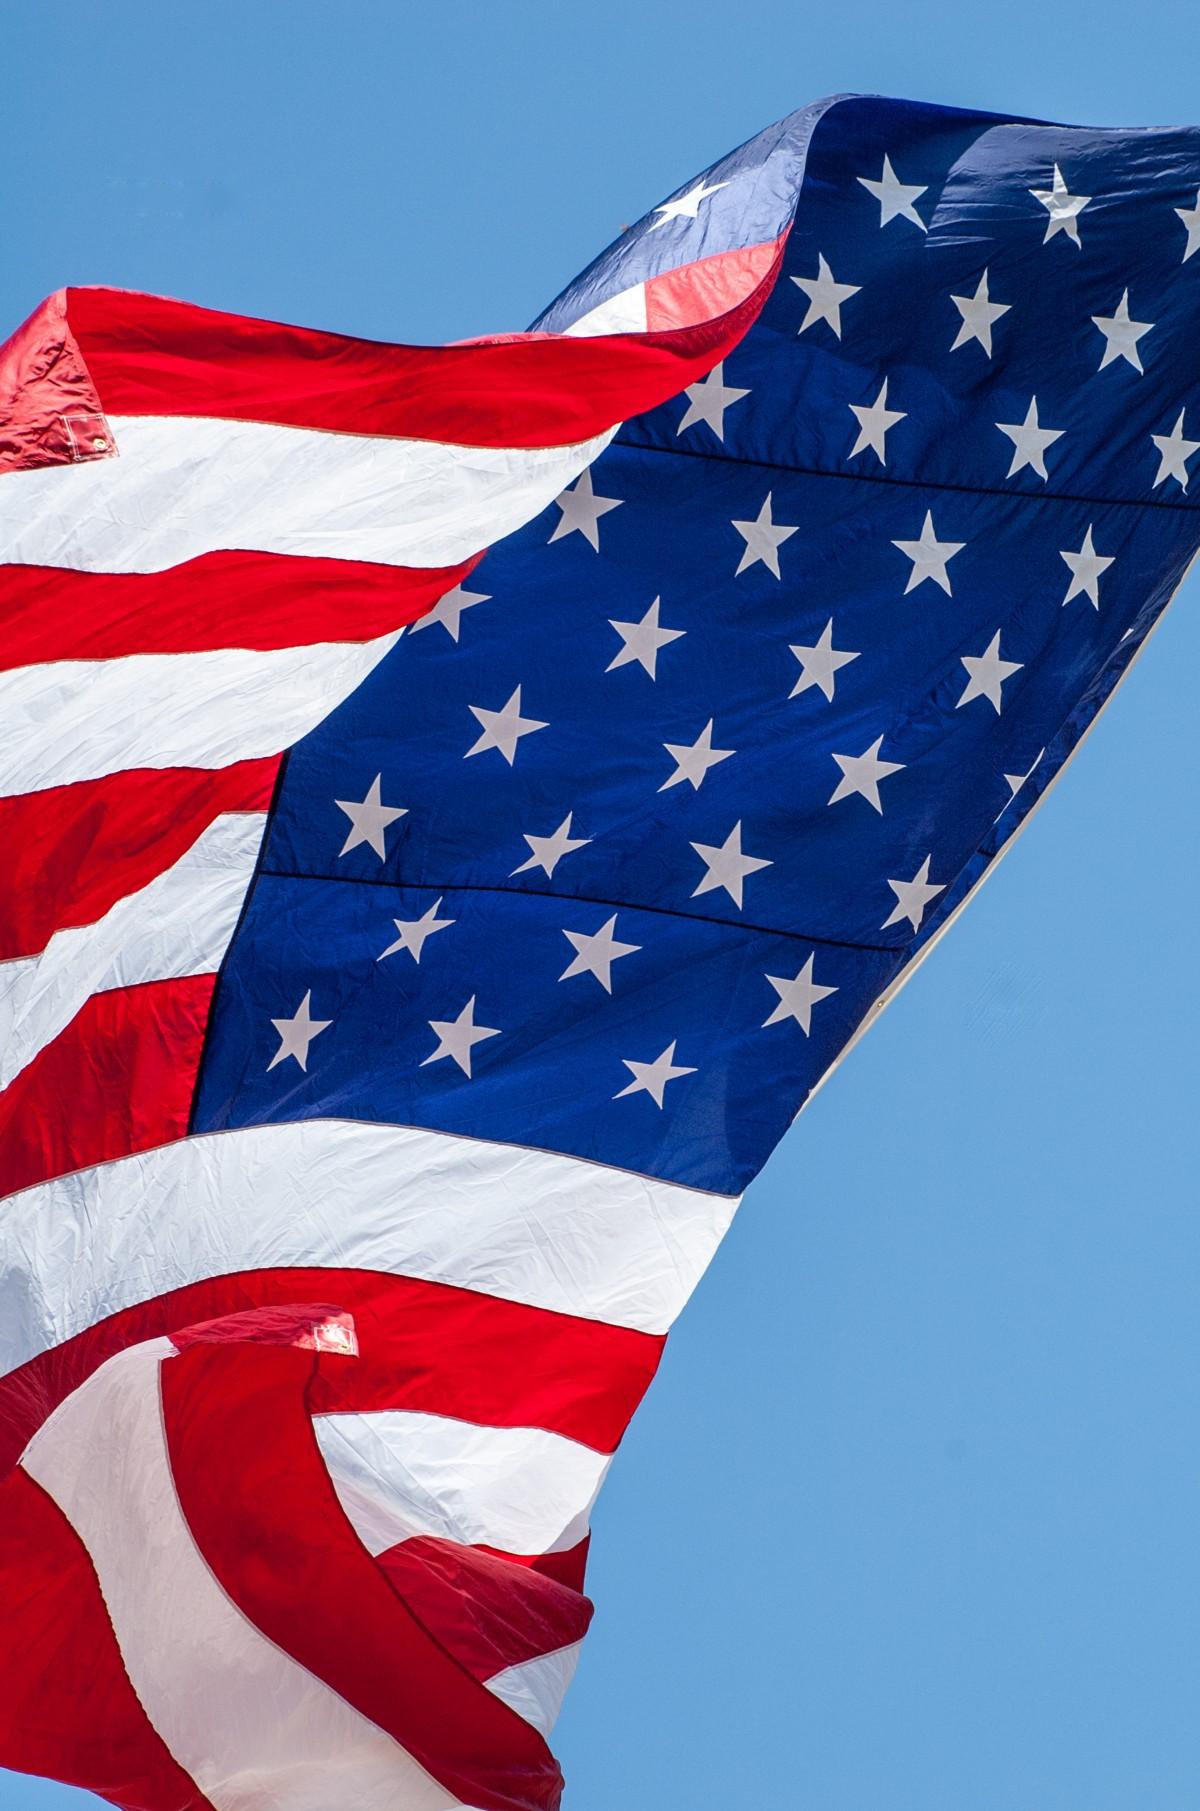 Diagram Free Images White Red American Flag Blue Patriotism